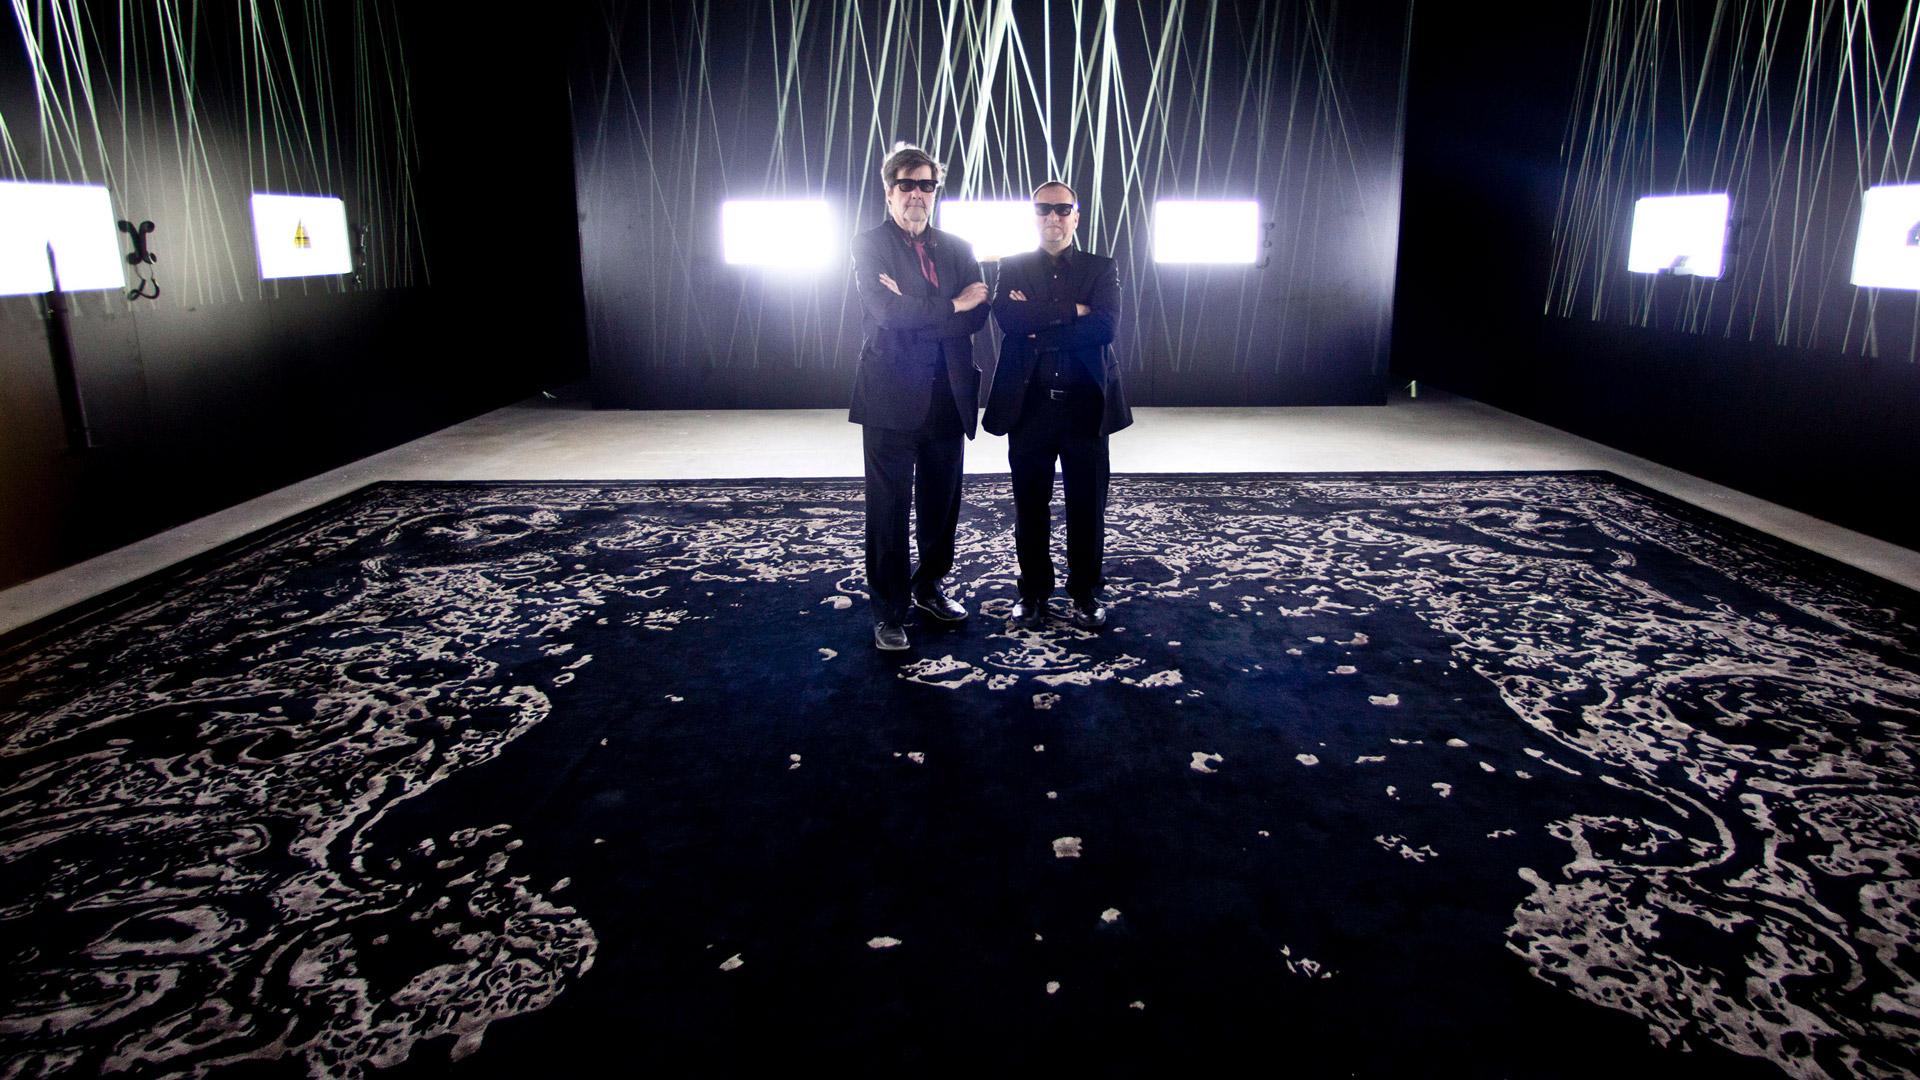 Art expert Florian Hufnagel stands next to designer Michael Keller in the exhibition room of the Schaustelle.